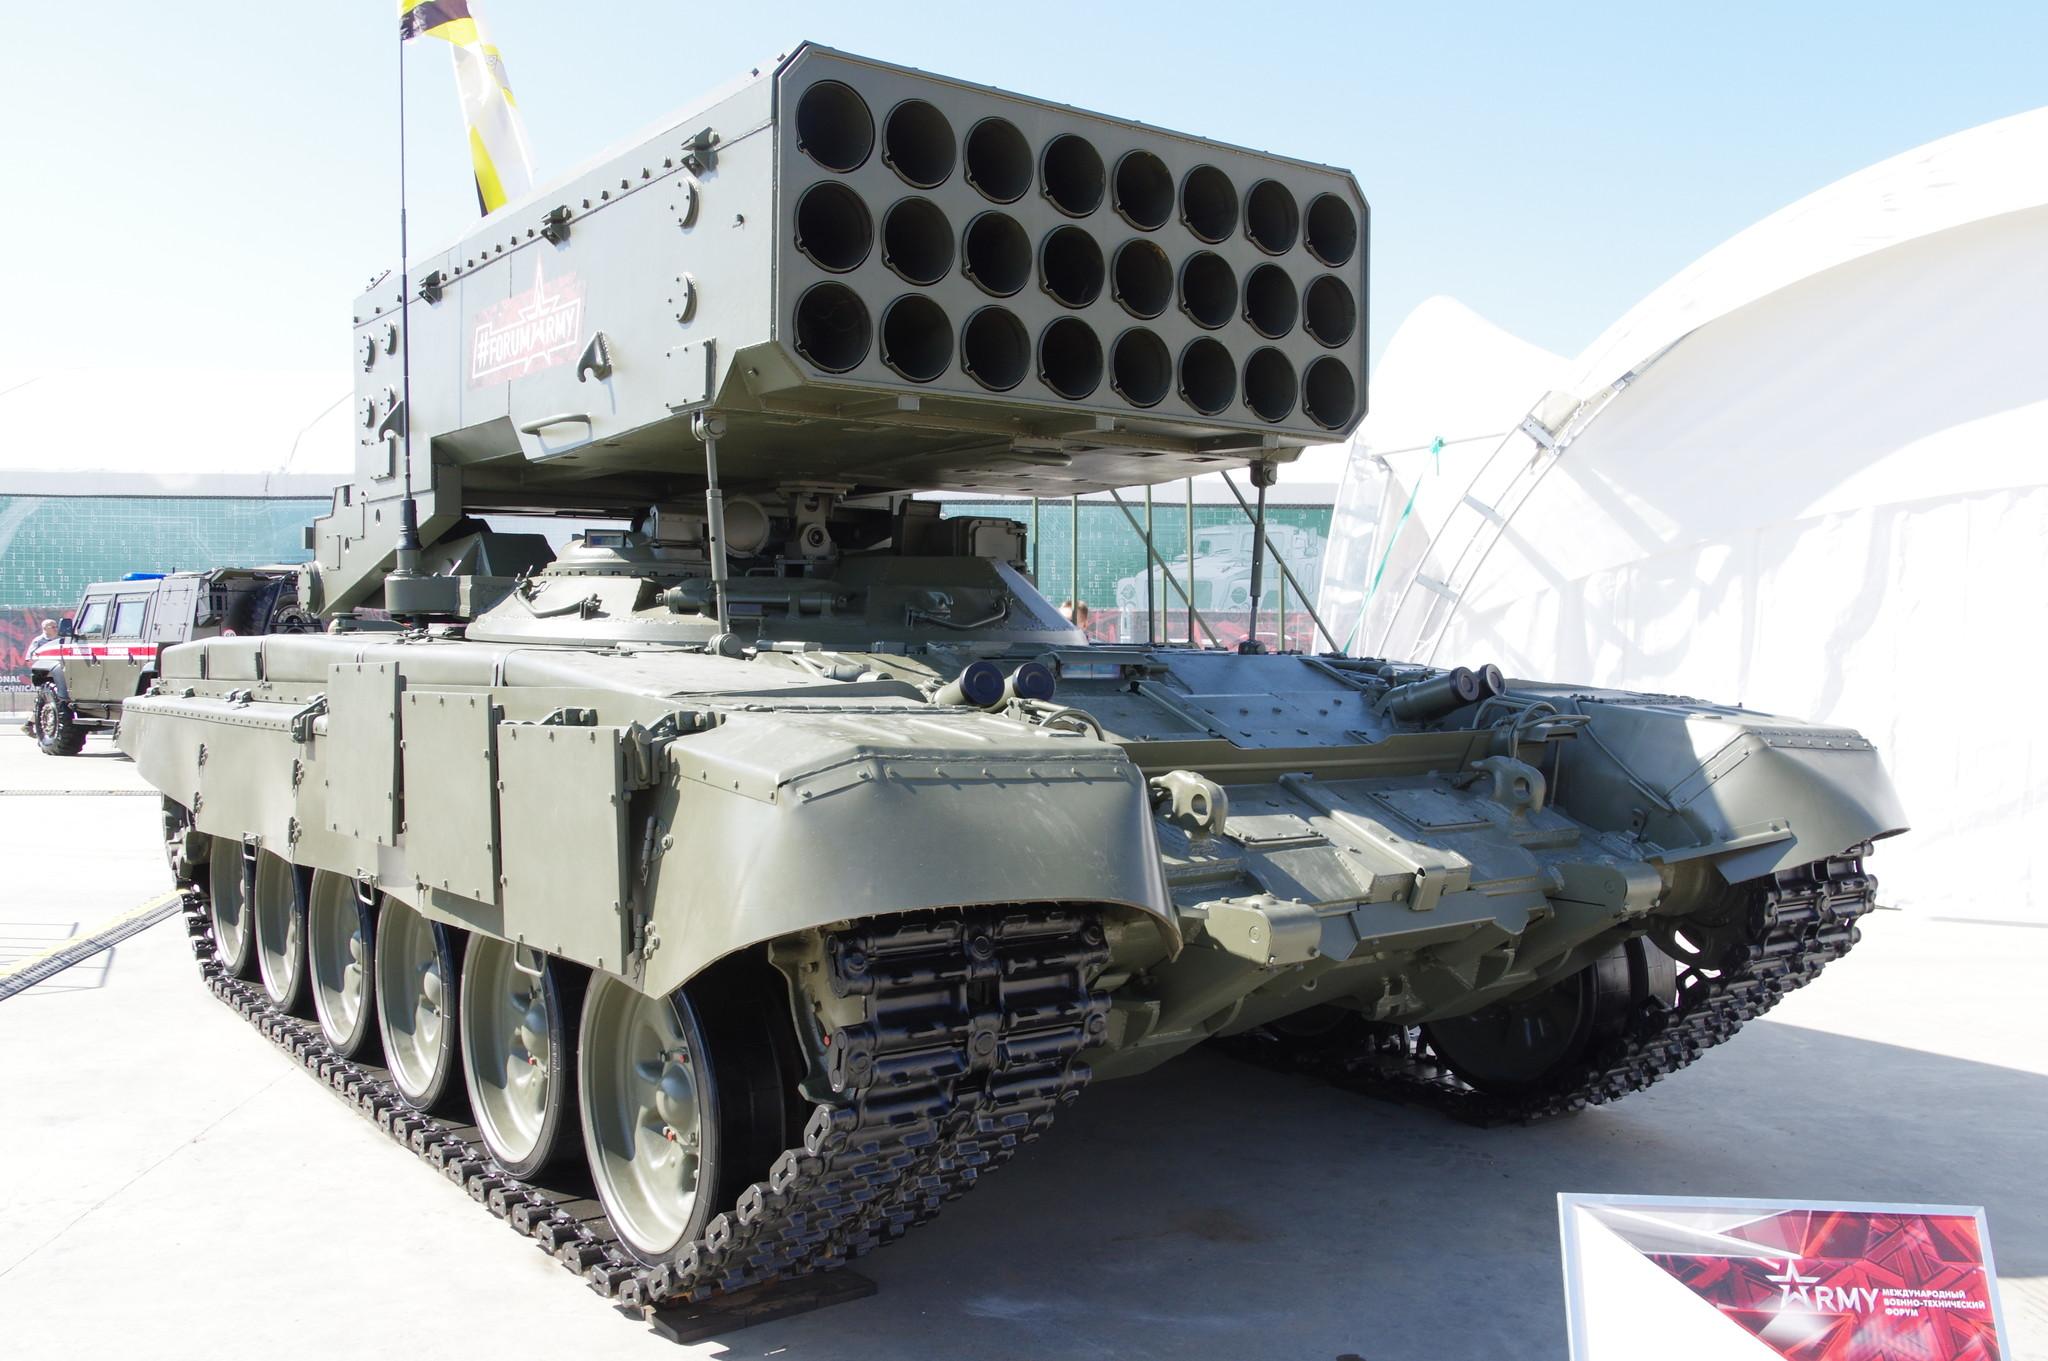 Тяжёлая огнемётная система ТОС-1А «Солнцепёк»